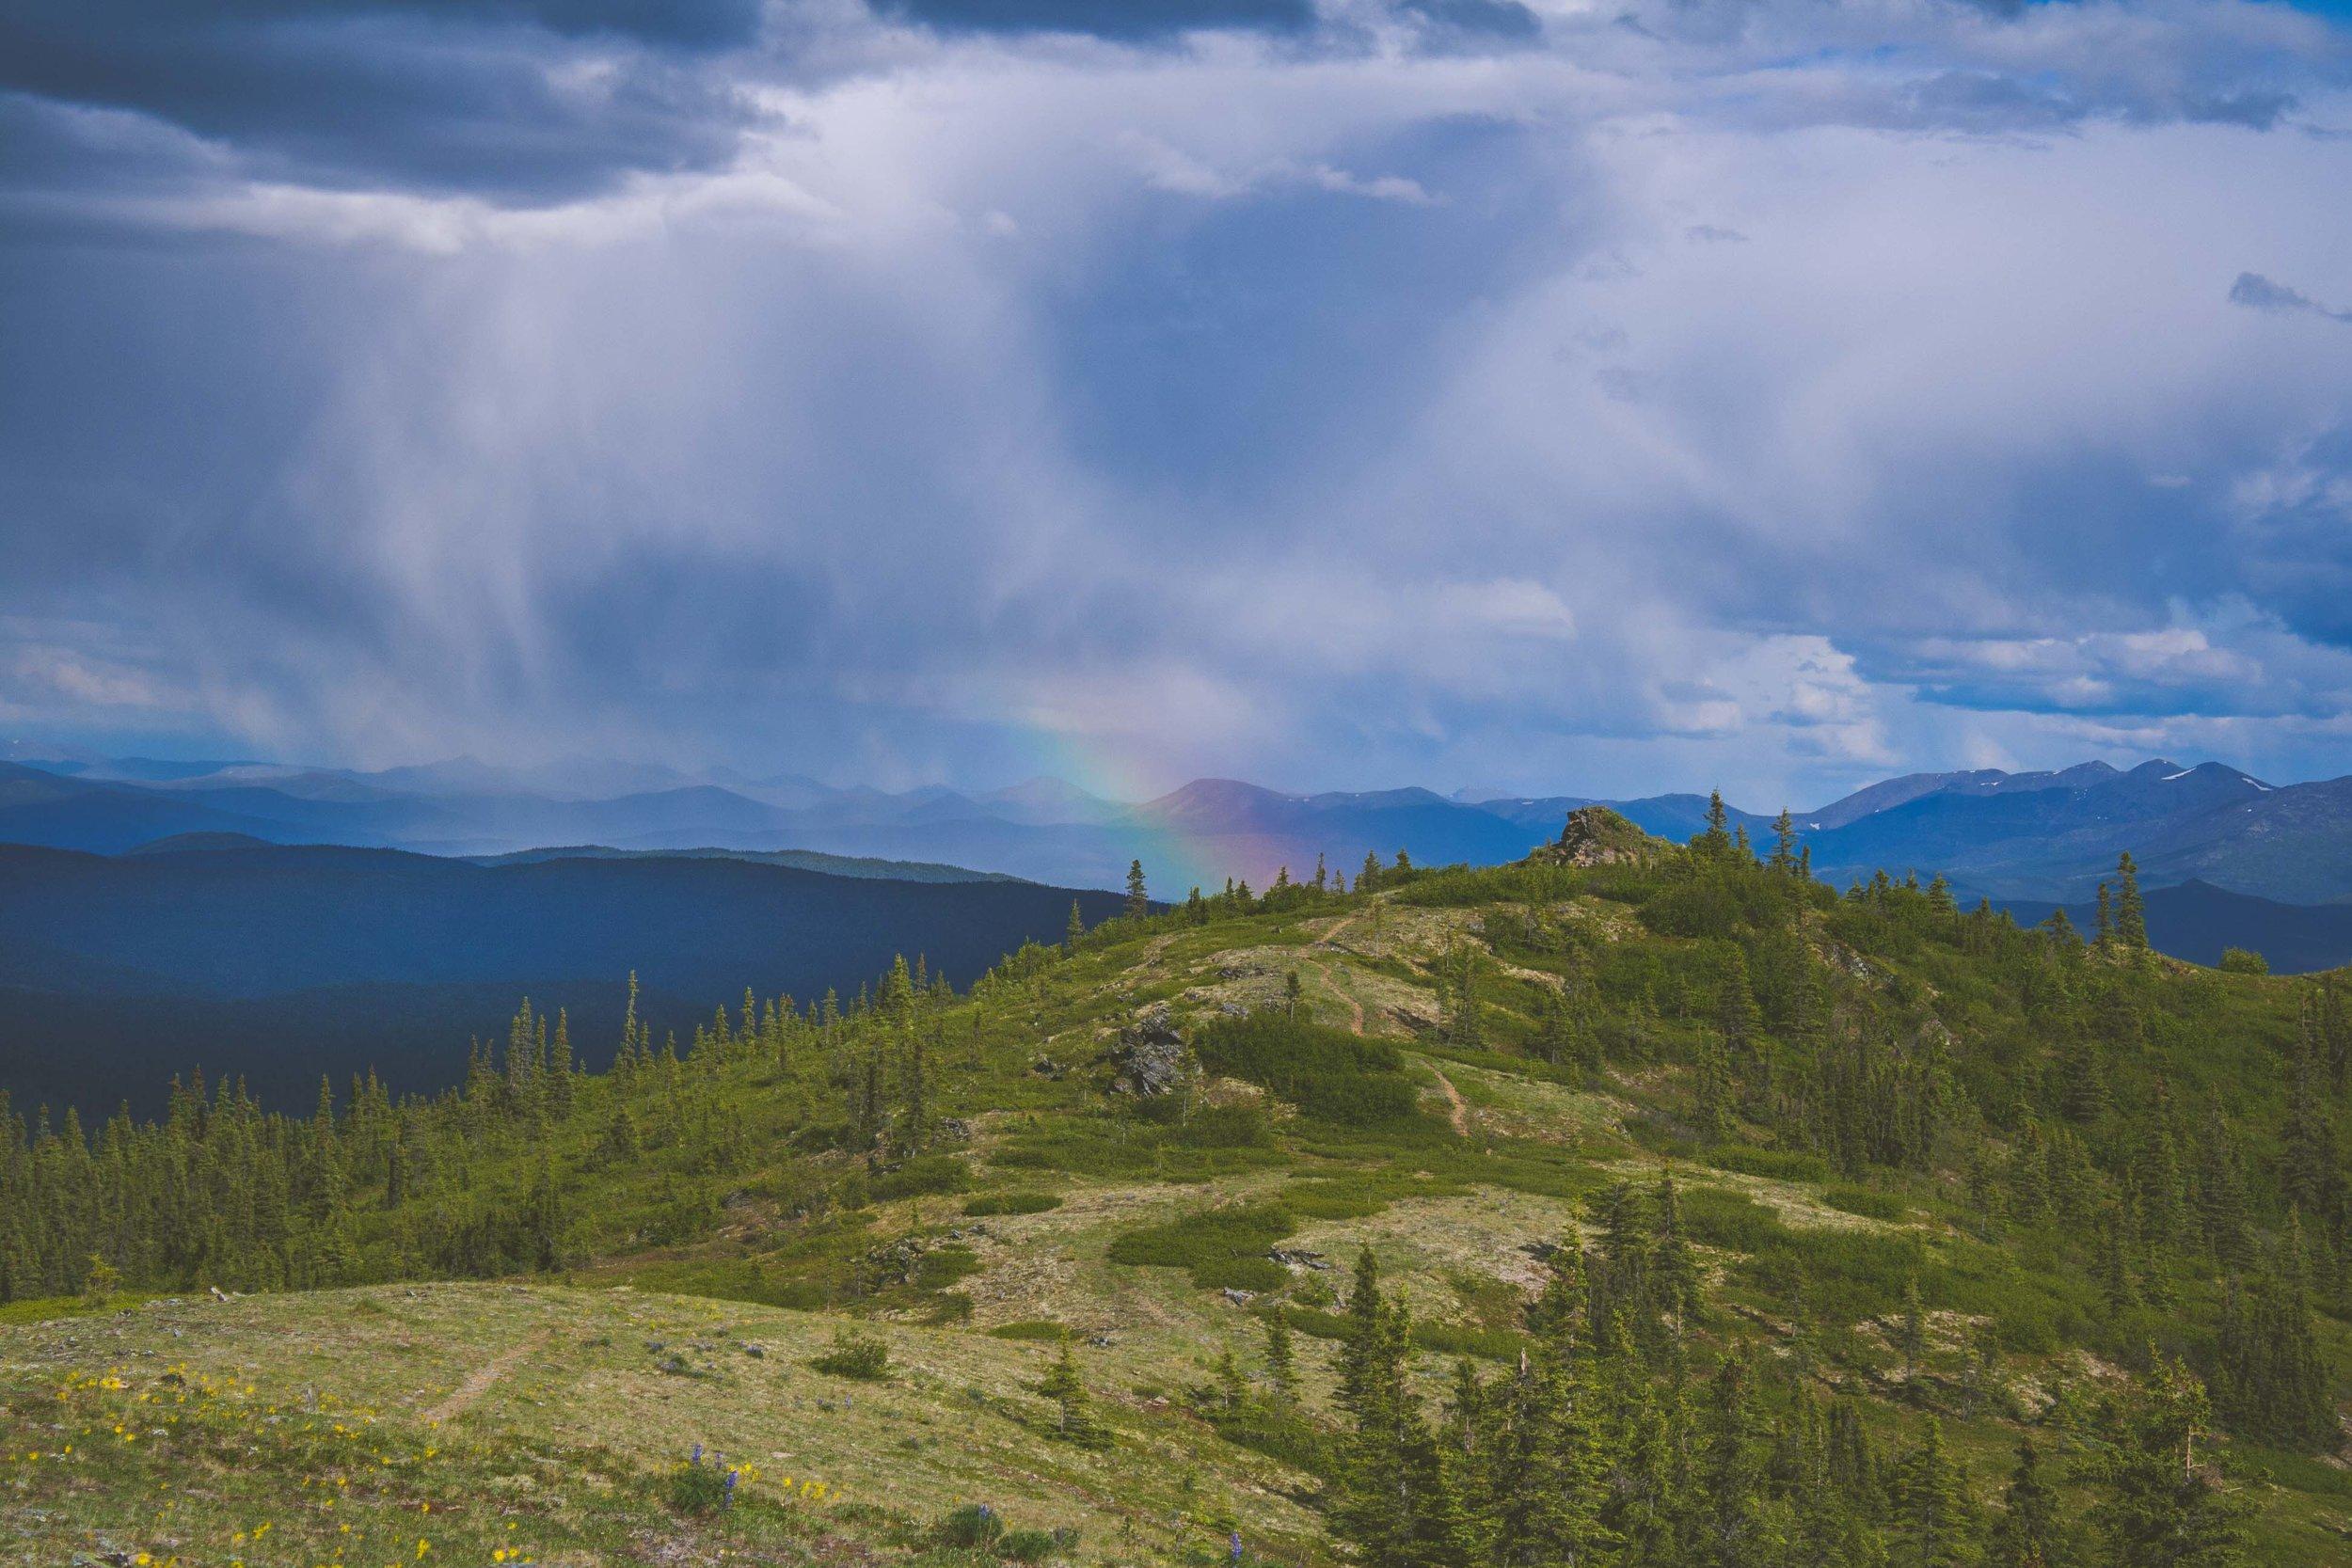 Chena Hot Springs Trail, Alaska. June 2015